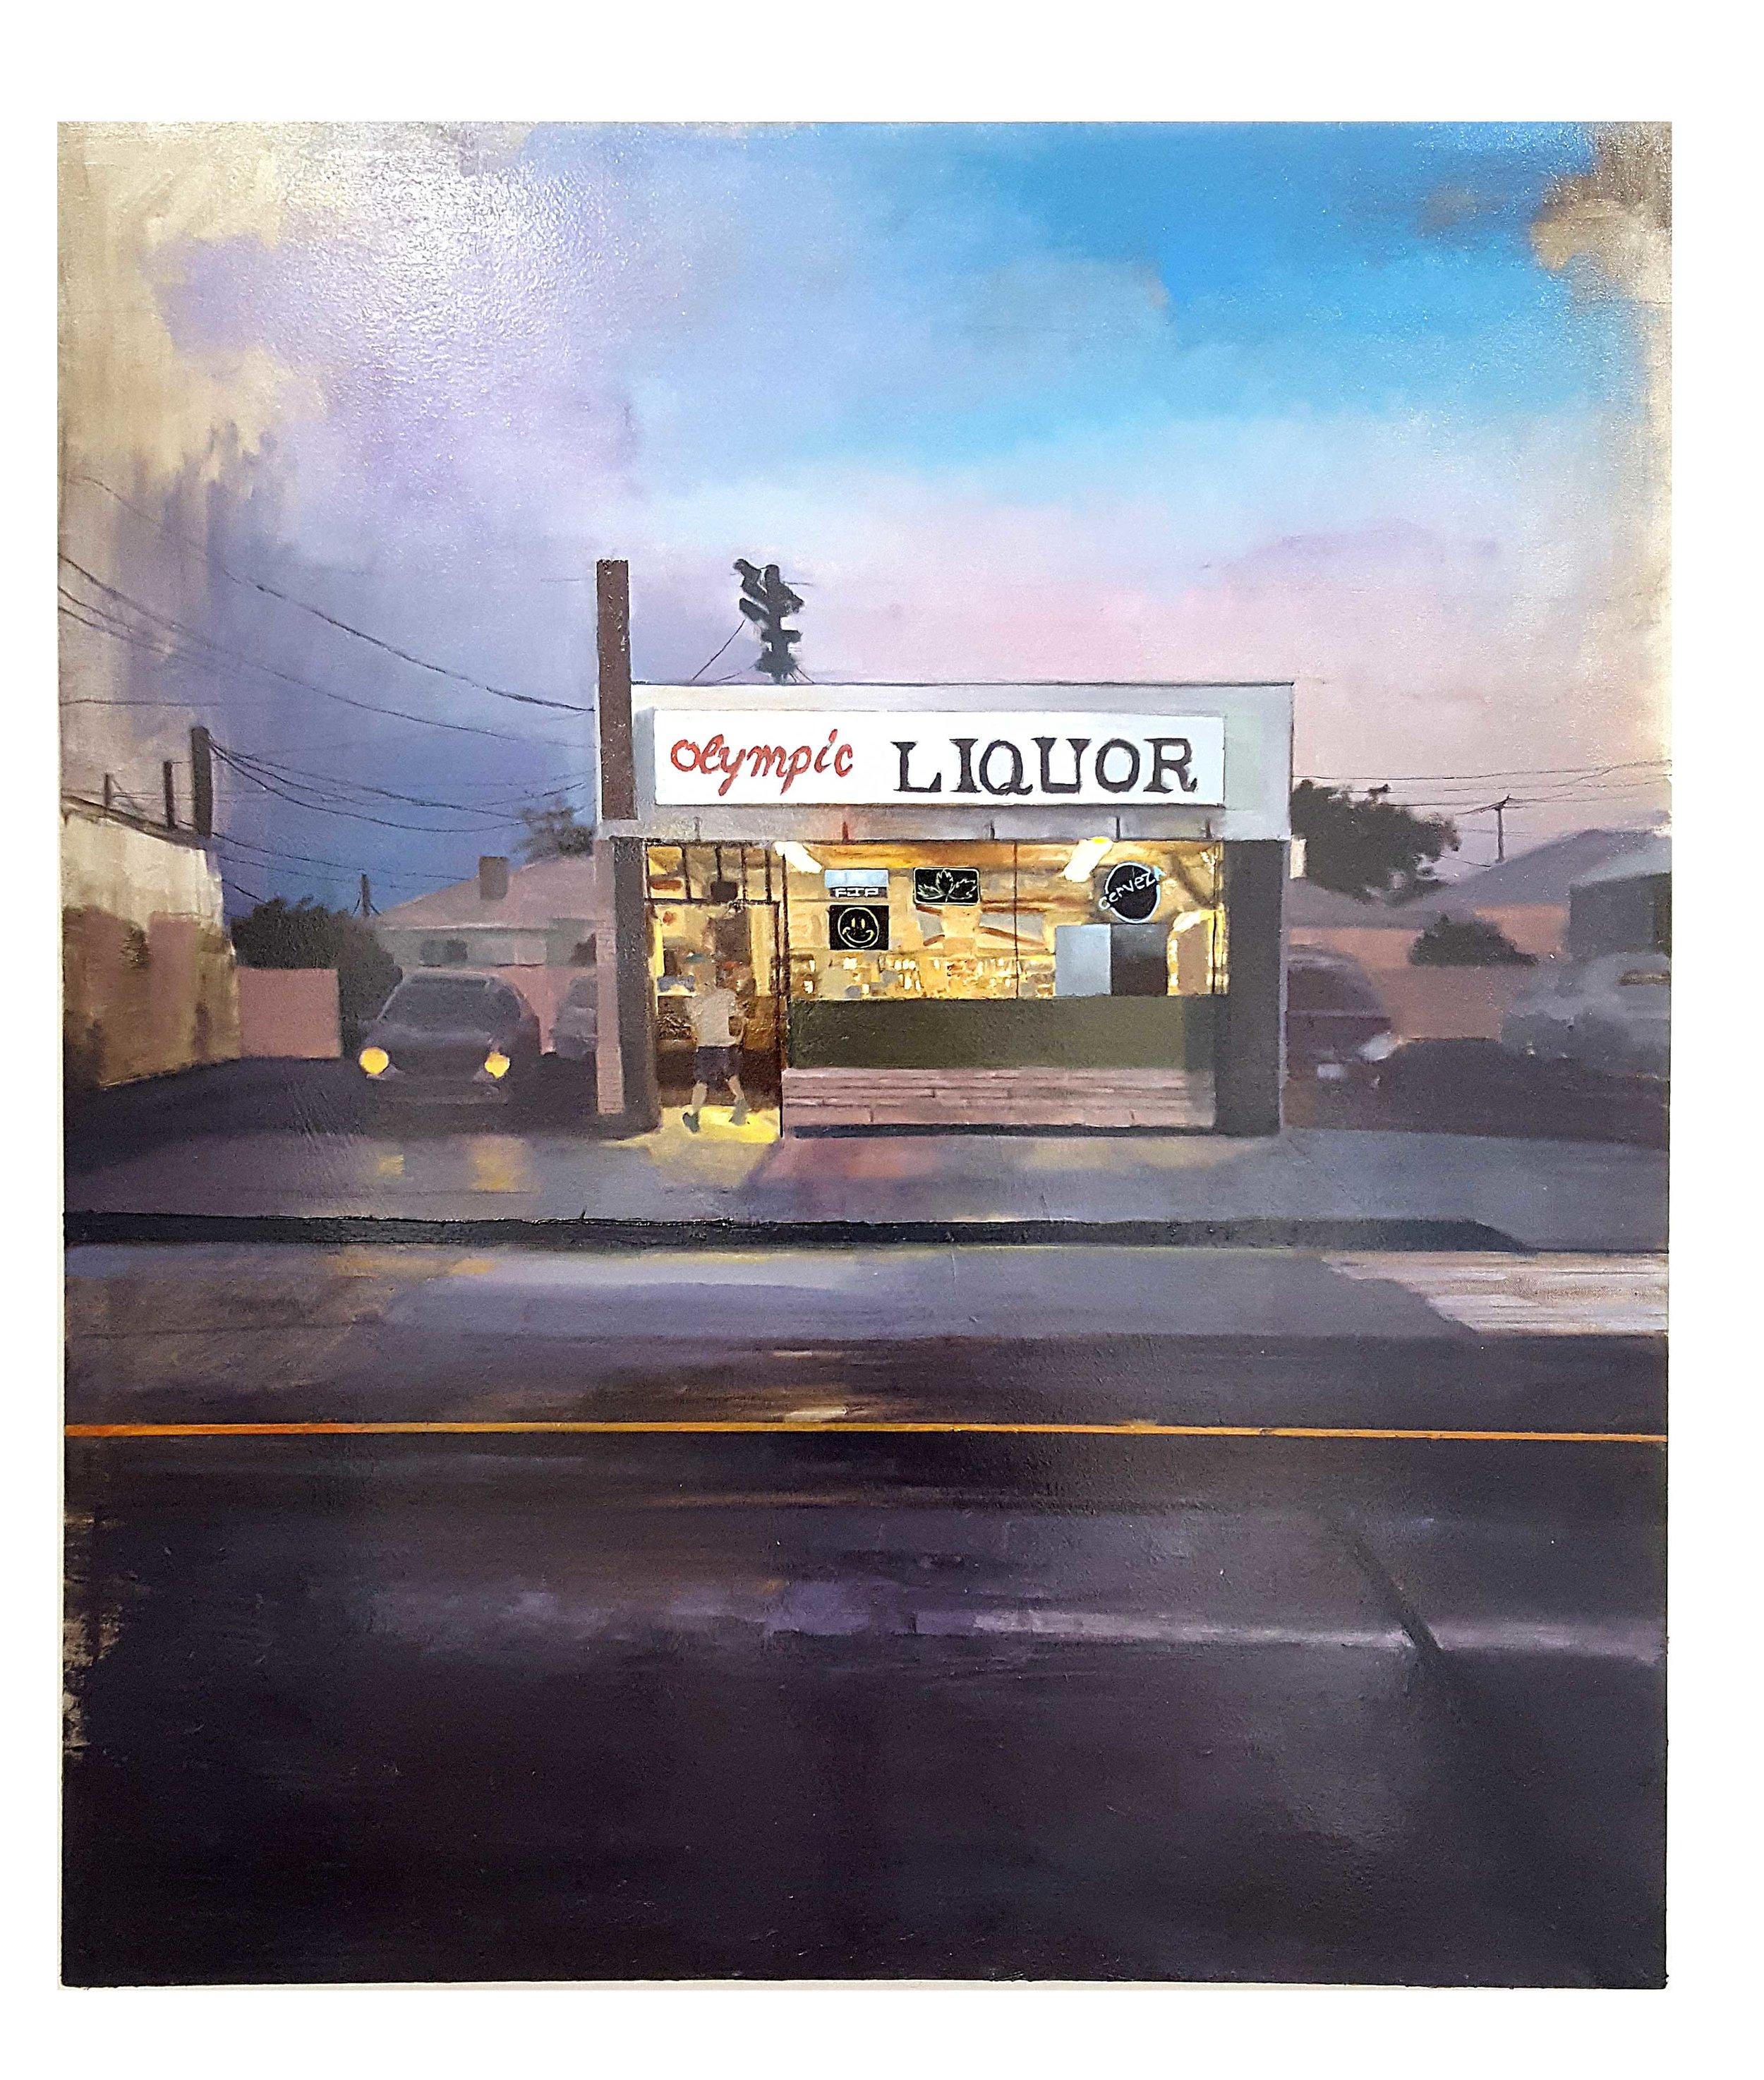 Olympic Liquor, Oil on canvas. 48x52 in